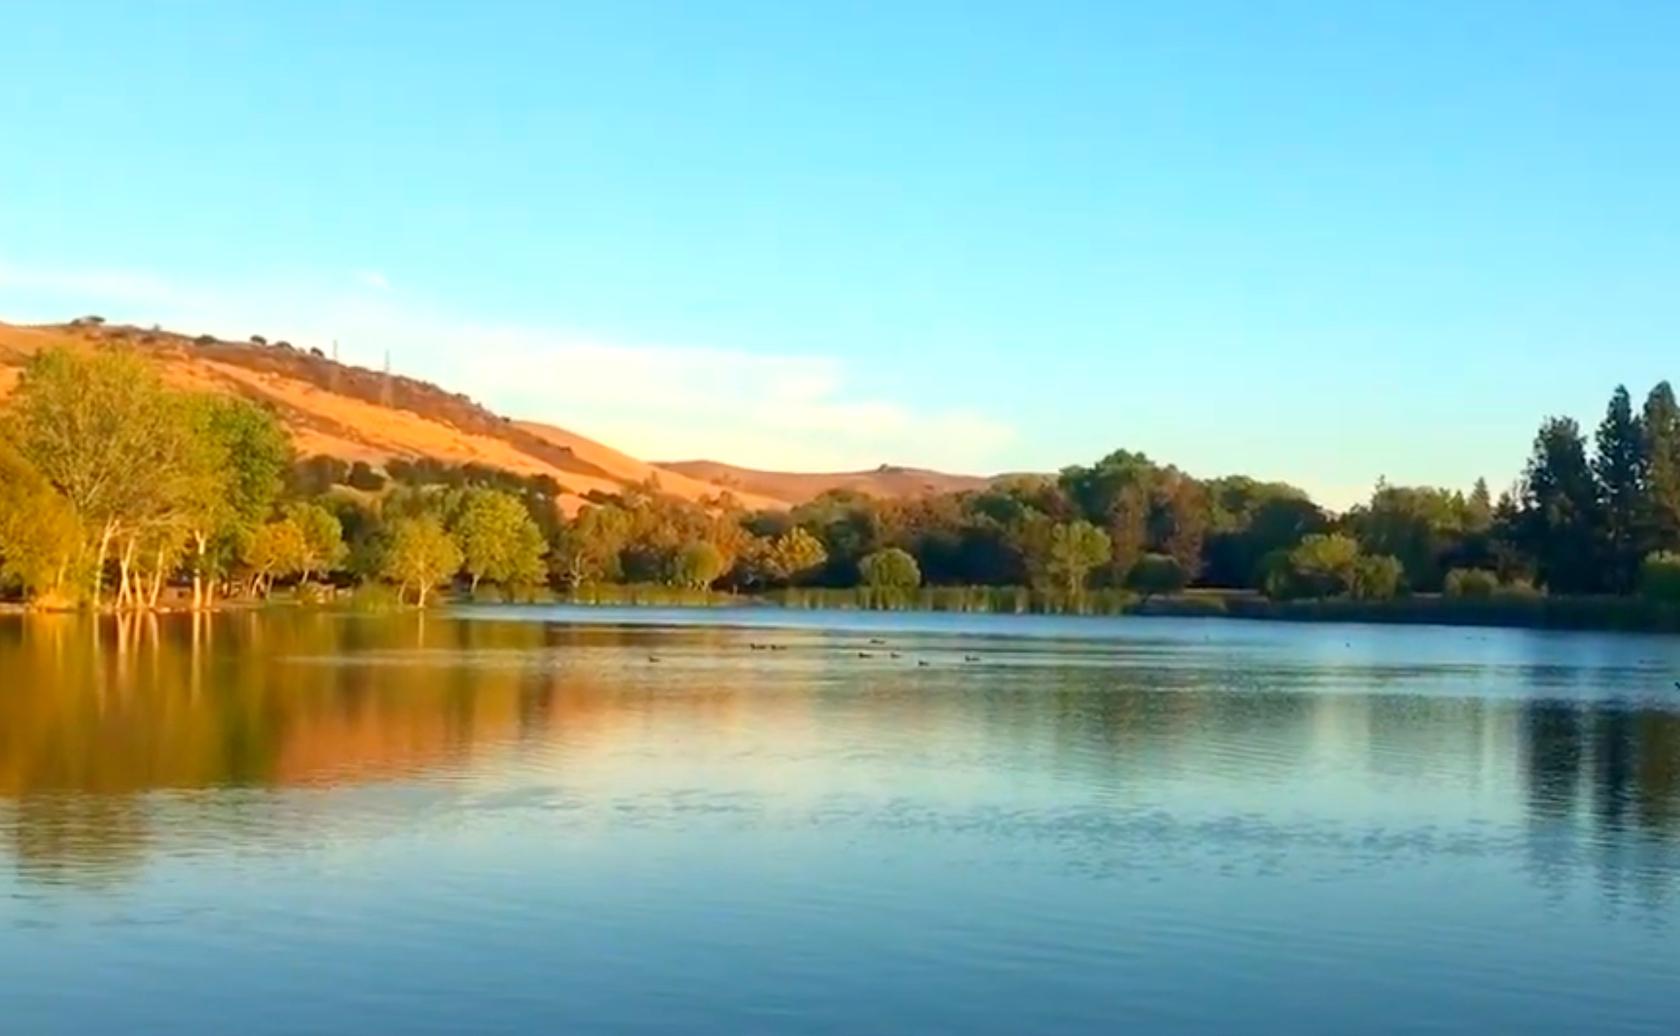 Cottonwood-Lake-Fishing-Guide-Report-San-Jose-CA-04